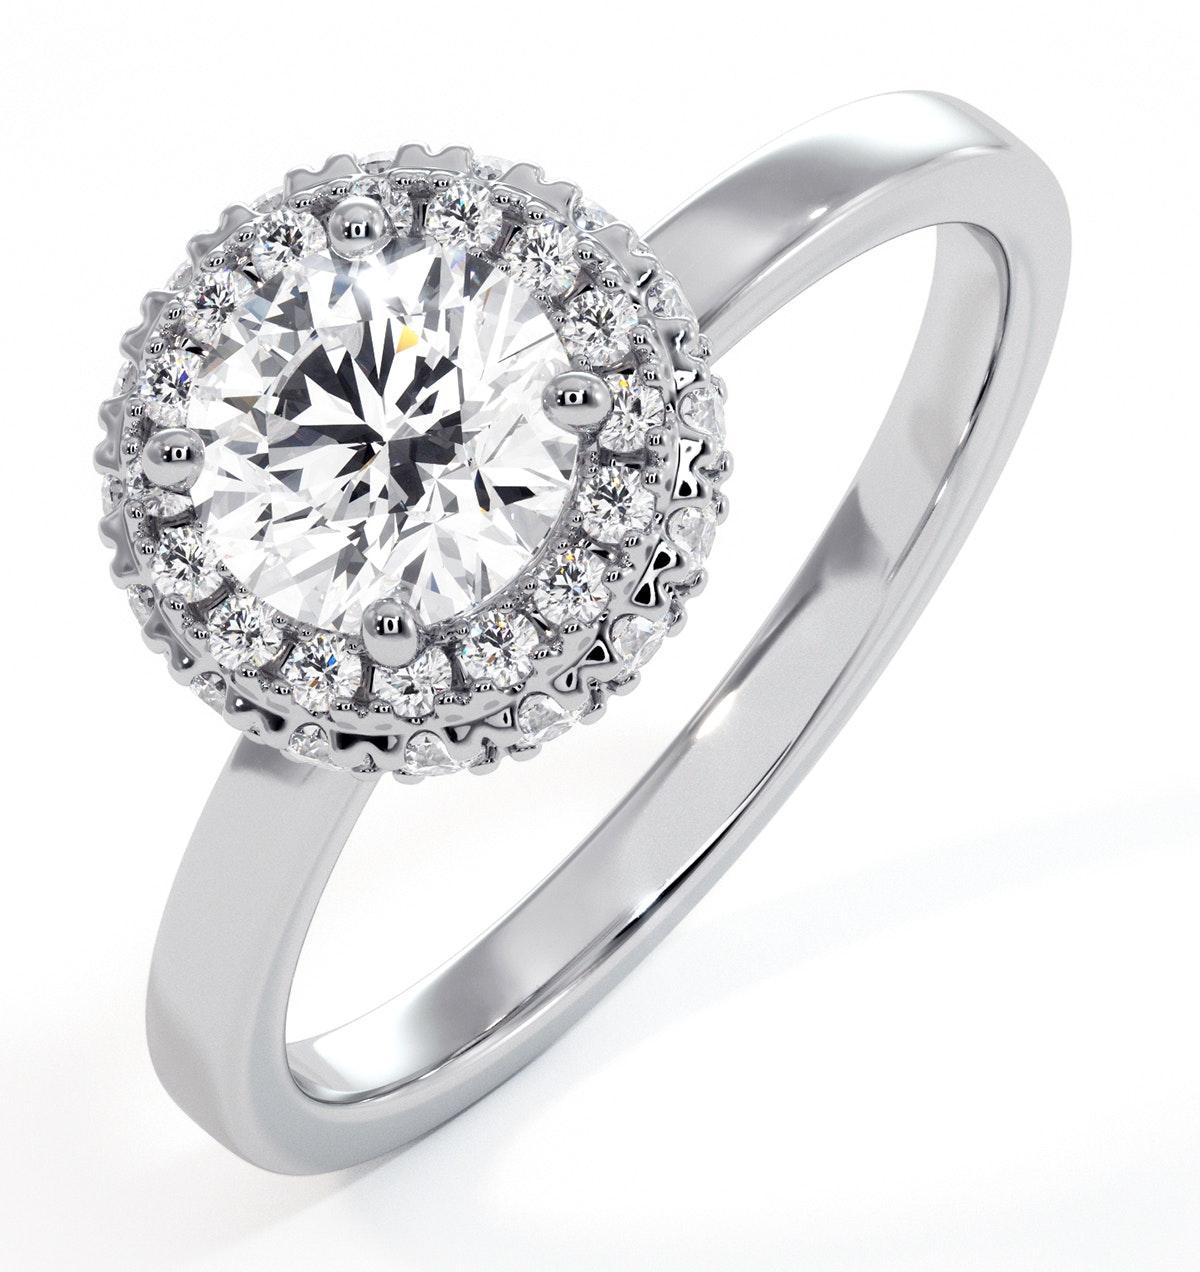 Eleanor GIA Diamond Halo Engagement Ring in Platinum 0.87ct G/VS2